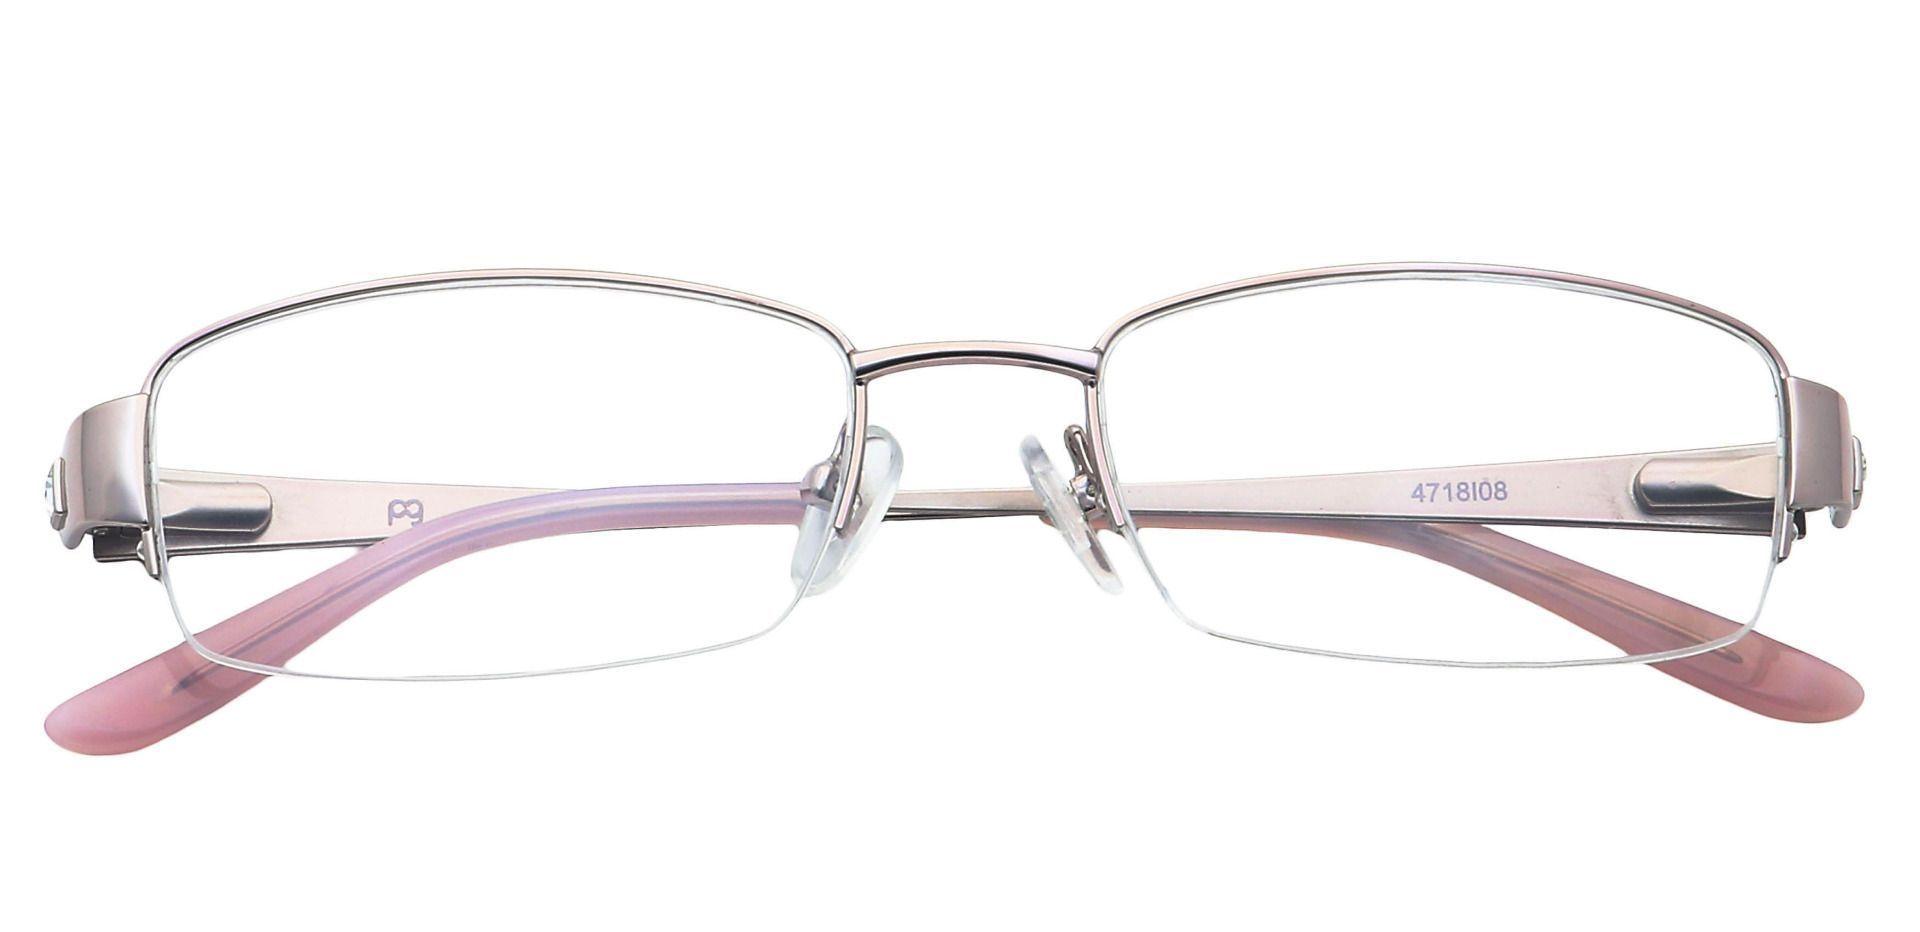 Gianna Rectangle Eyeglasses Frame - Pink